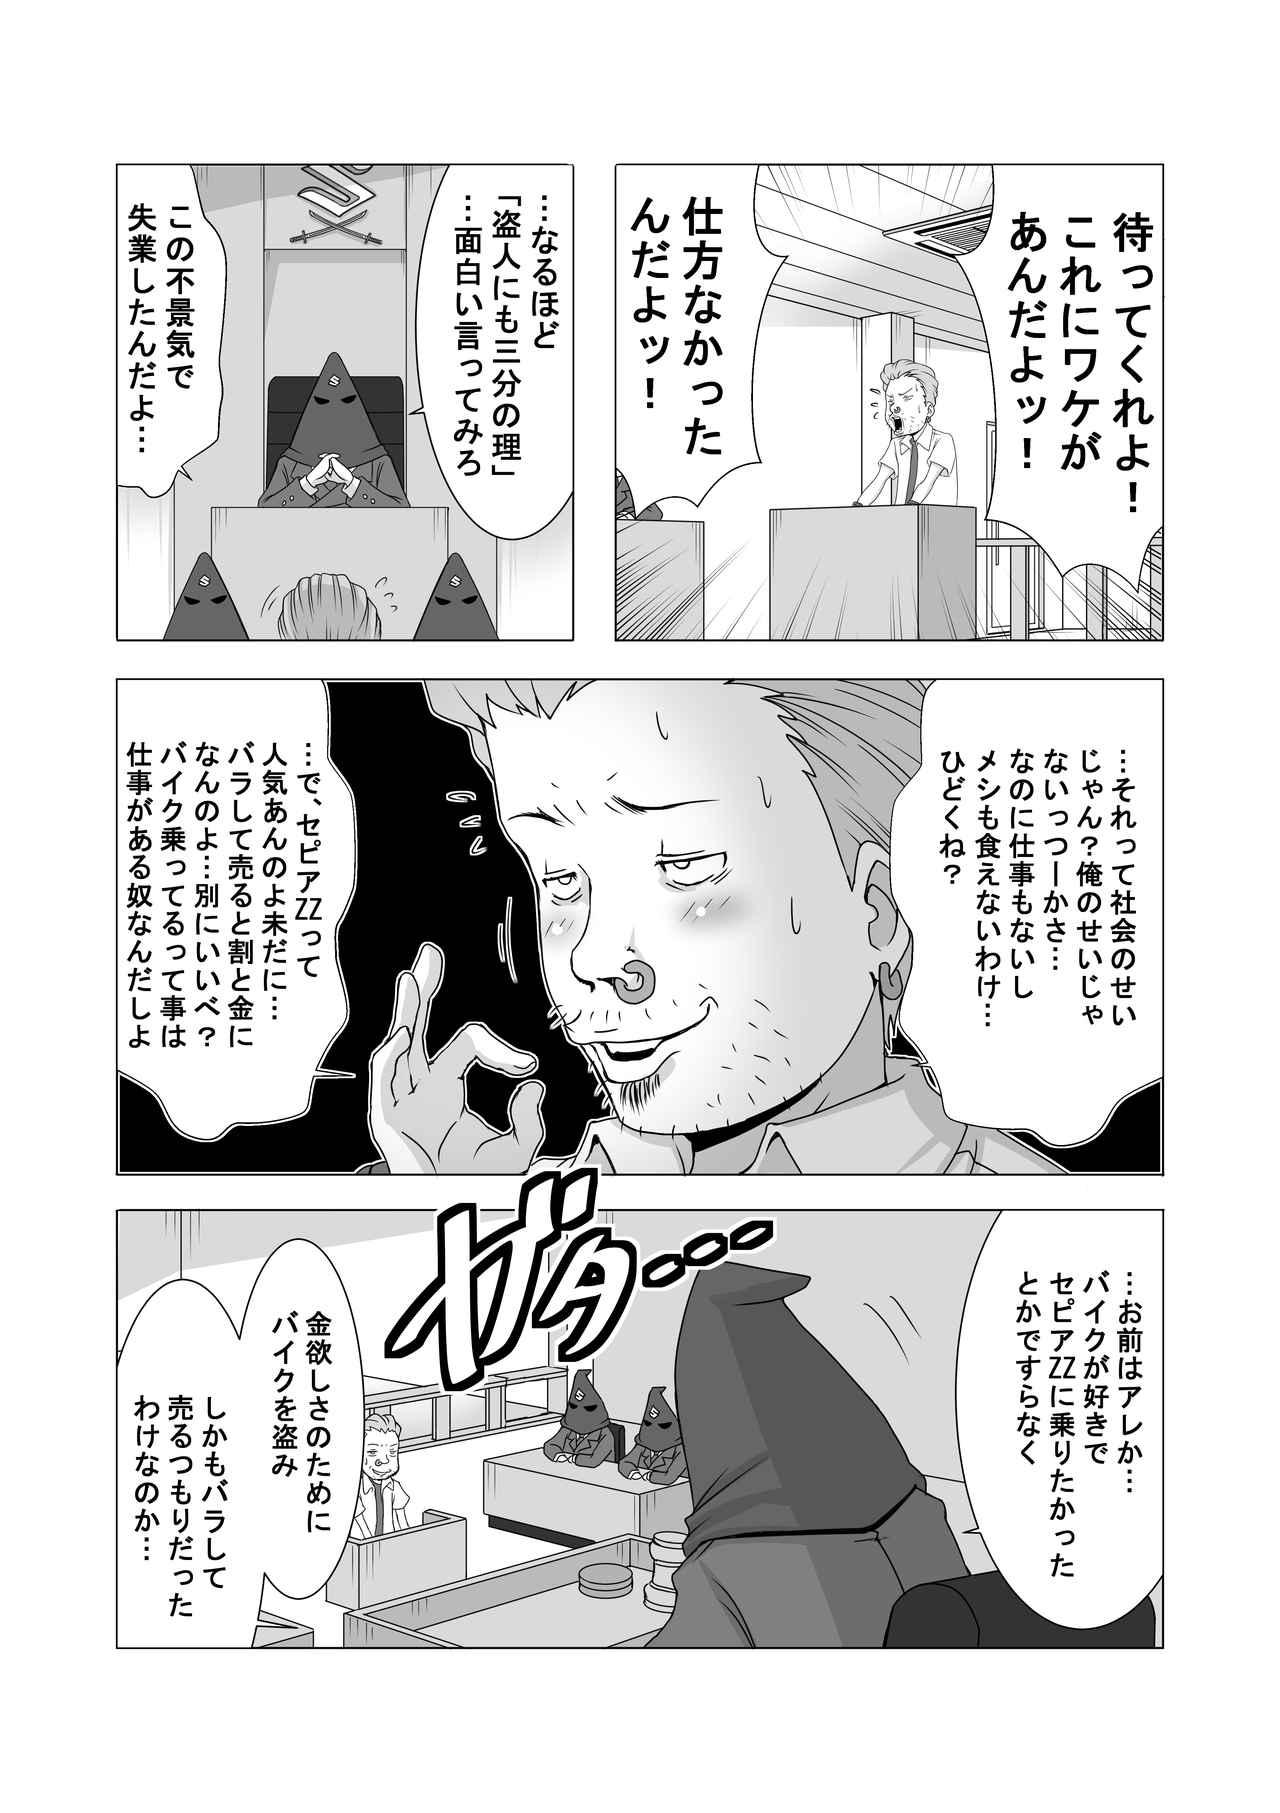 画像3: 『バイク擬人化菌書』単行本 第1〜5巻、好評発売中!